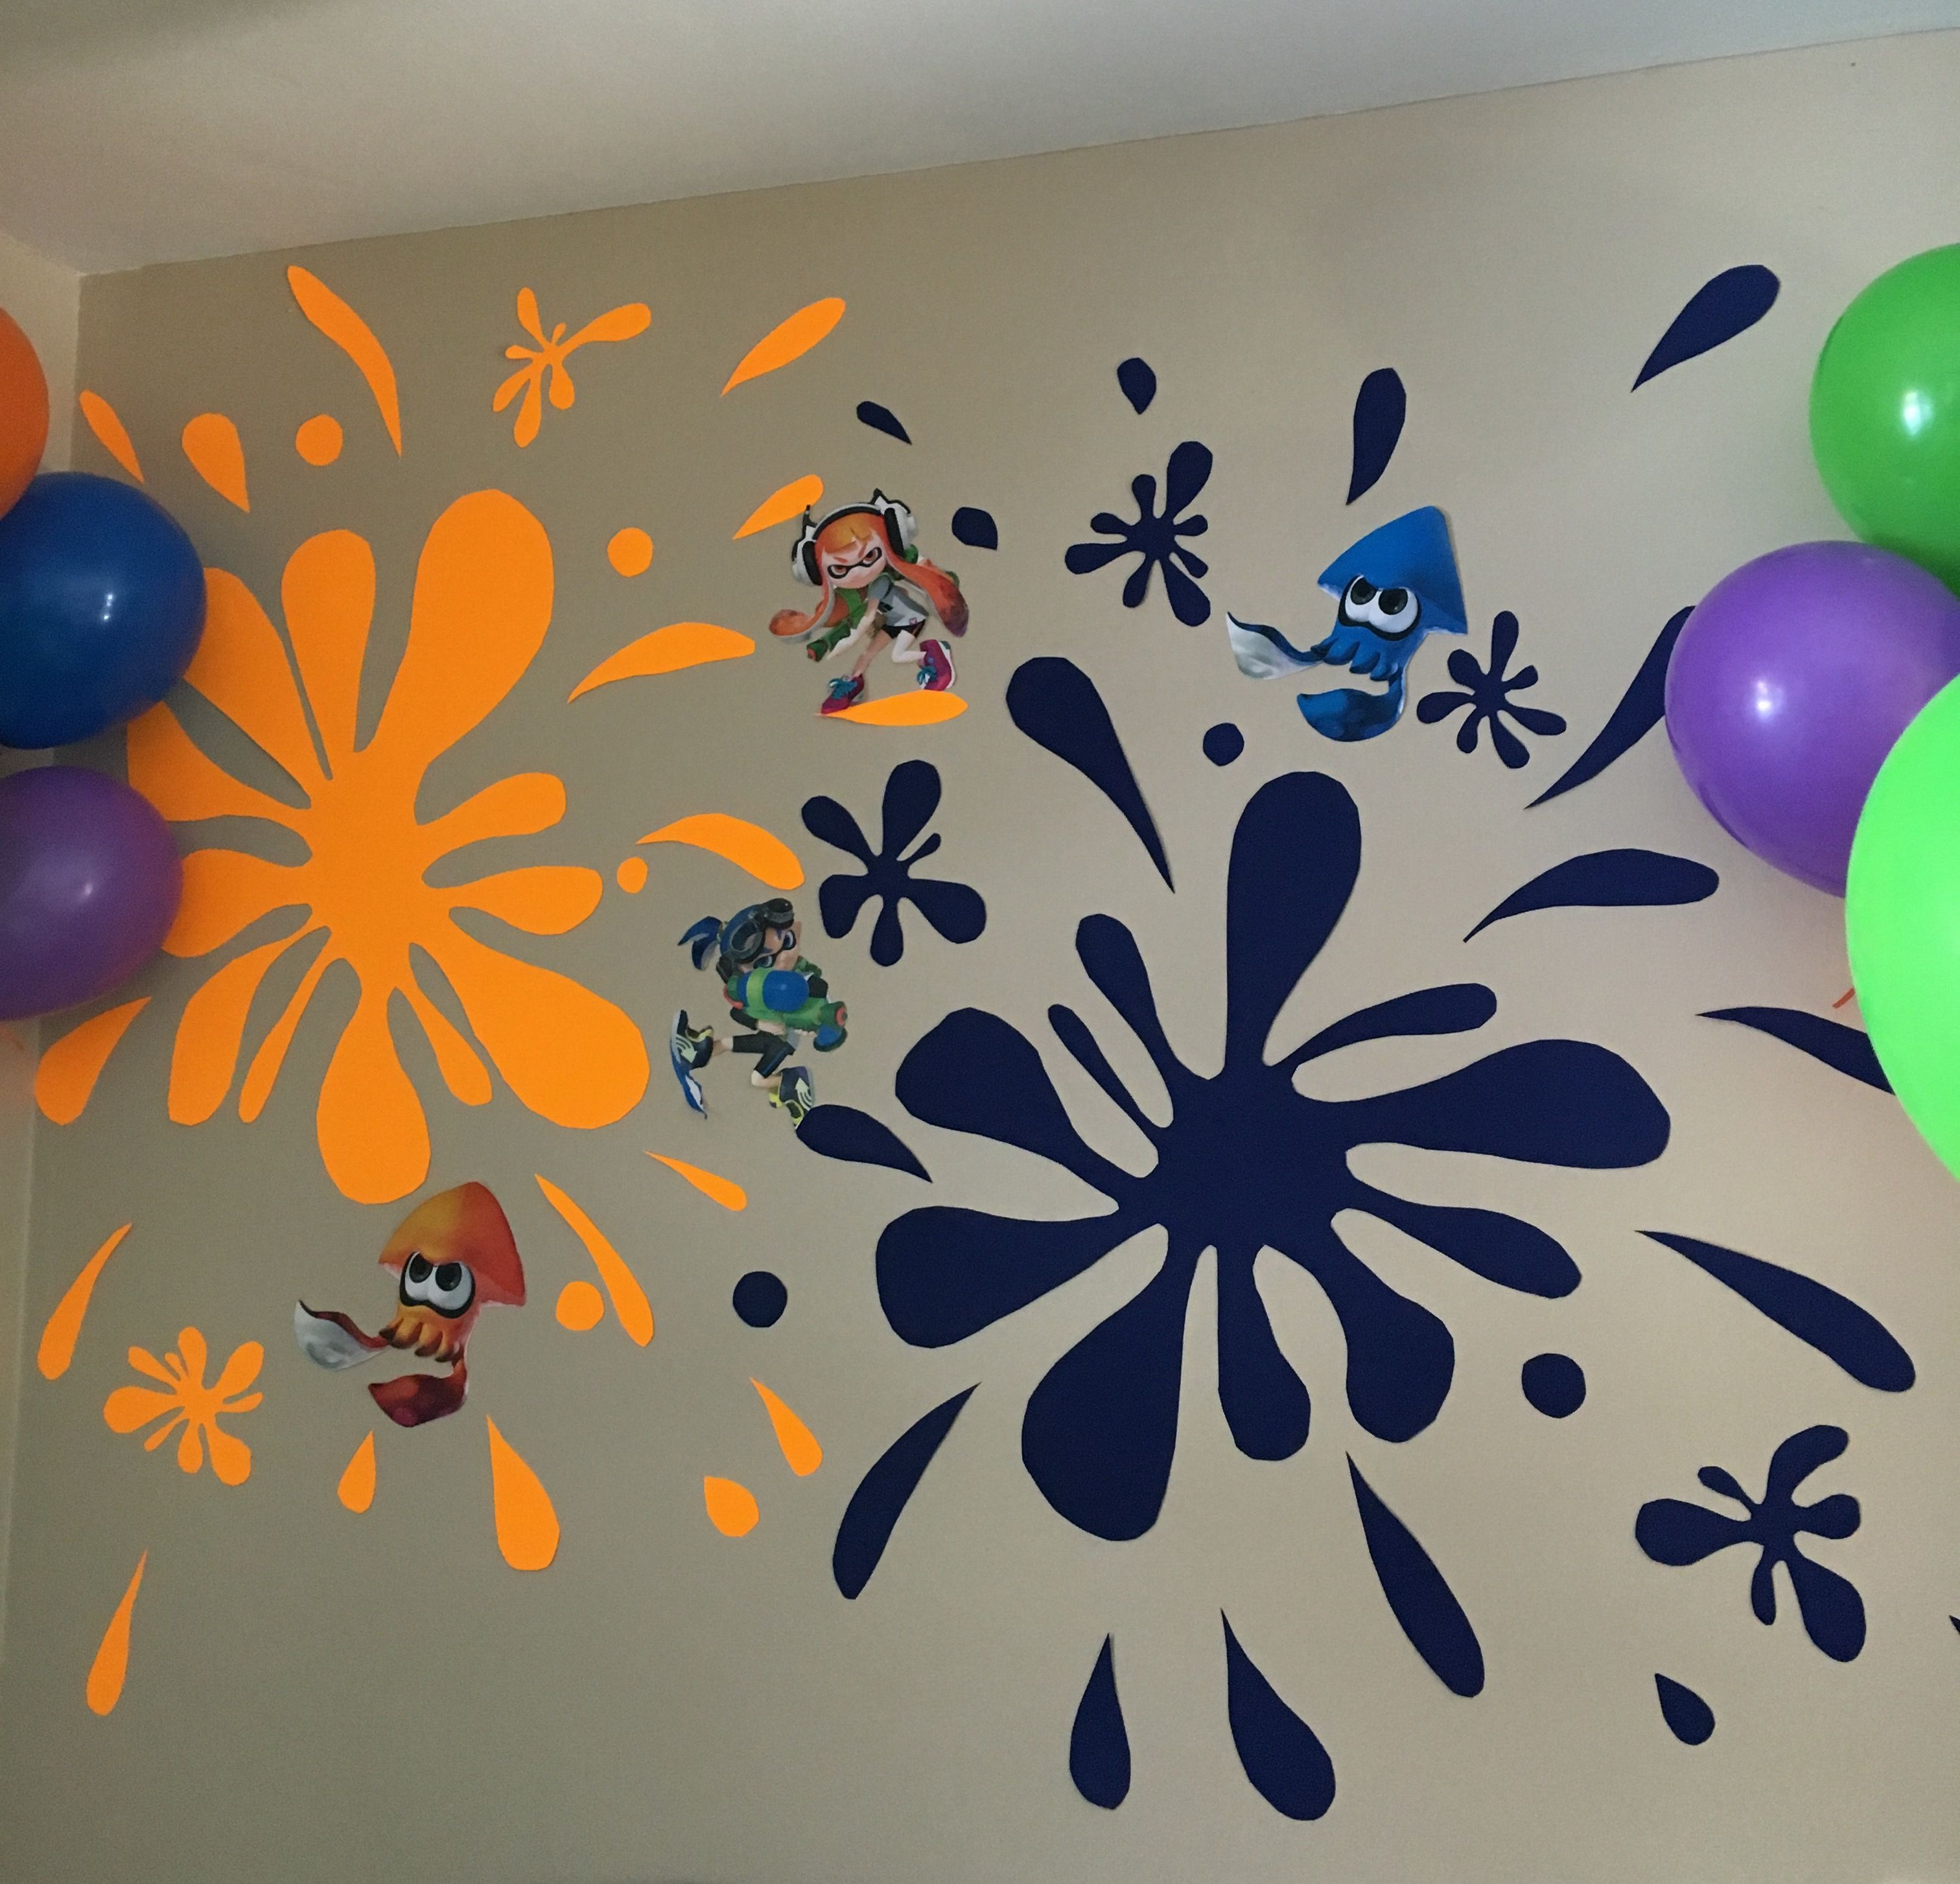 Splatoon Wall Decal Sticker Bedroom Vinyl Kids Art Decor Inkling Green